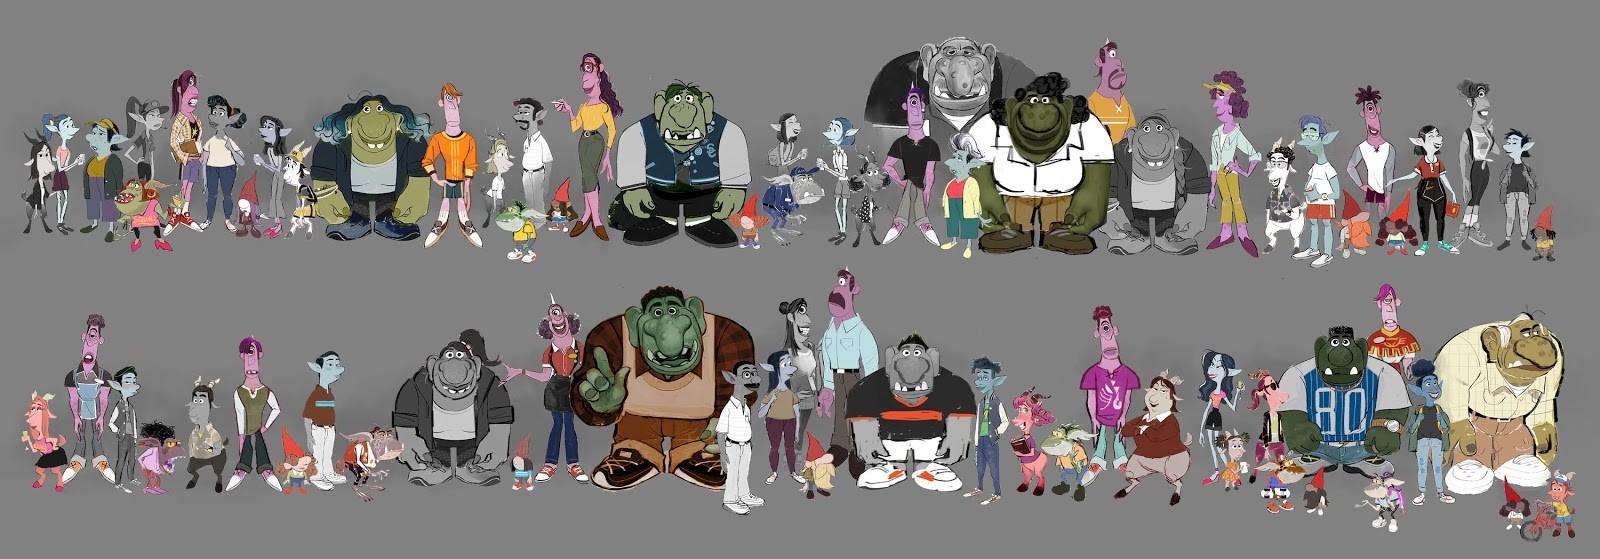 Character-Lineup-Pixar-Onward.jpg